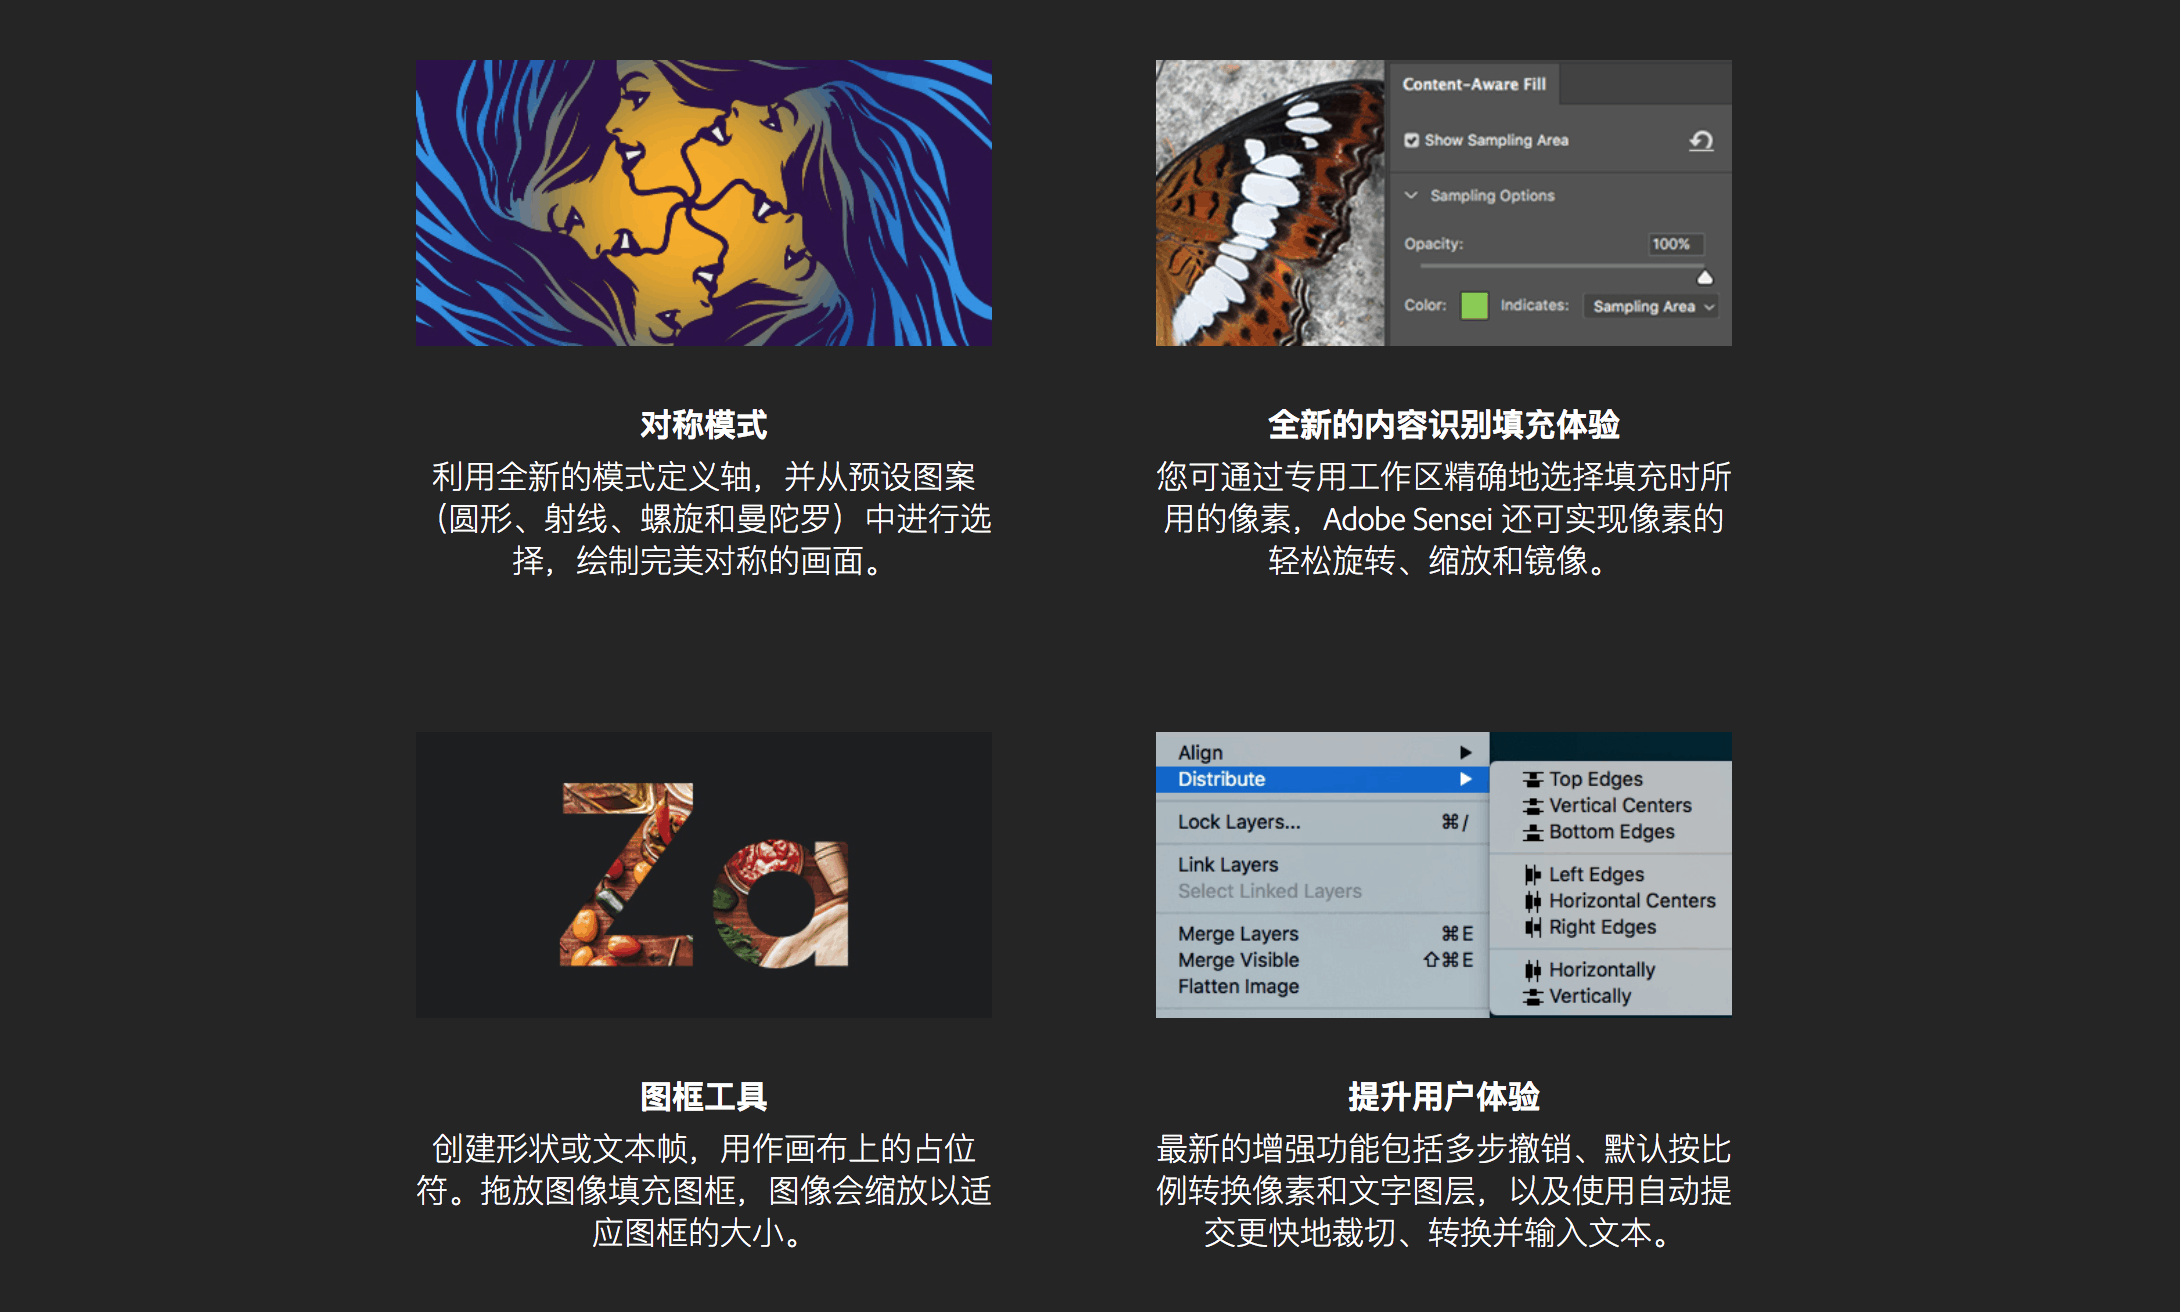 Adobe Photoshop CC 2019 20.0.3 强大的图形编辑工具-Mac毒